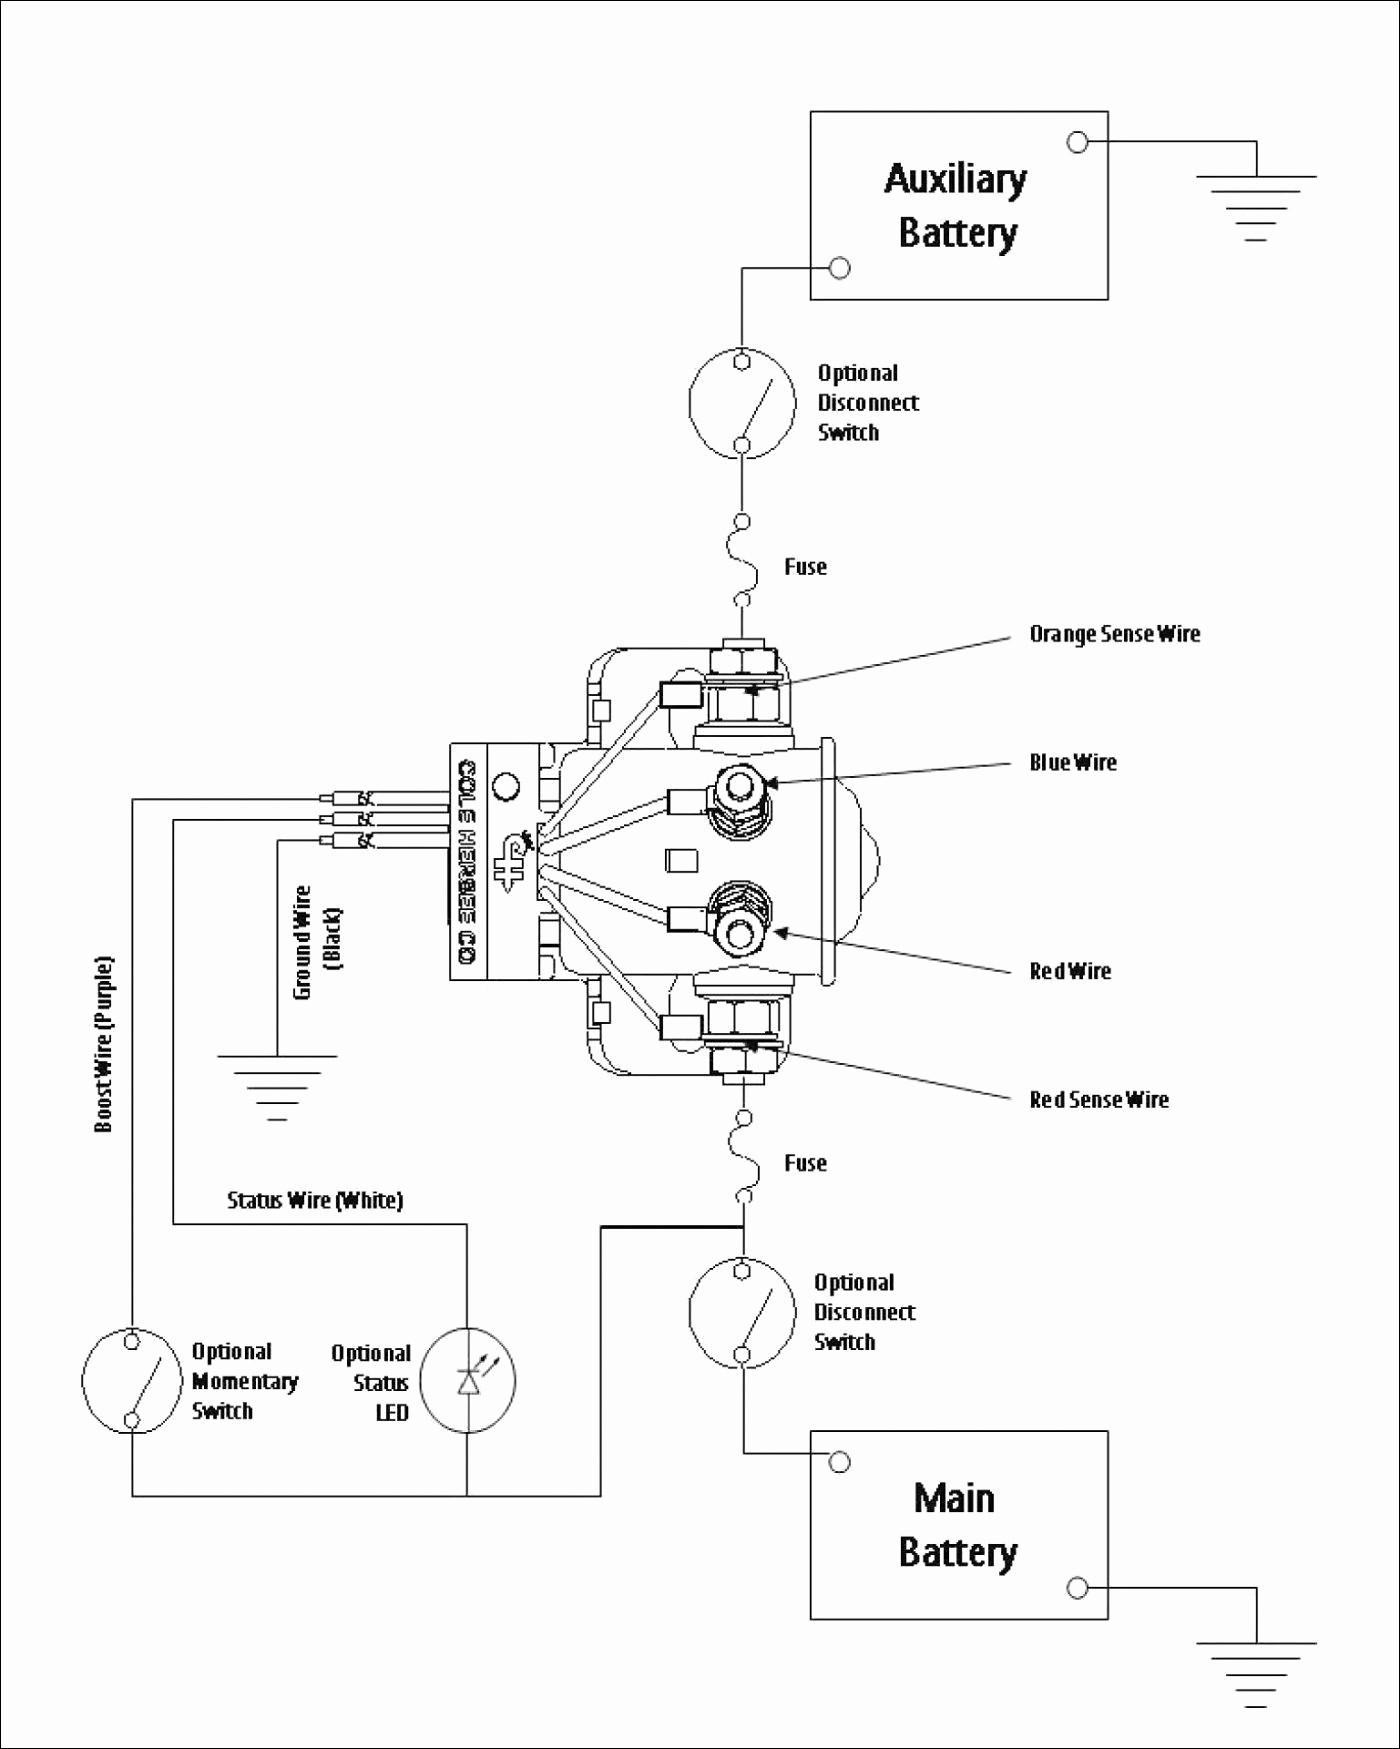 Meyer Snow Plow Wiring Diagram E47 Old Meyer Plow Light Wiring Diagram Schematics Wiring Diagrams • Of Meyer Snow Plow Wiring Diagram E47